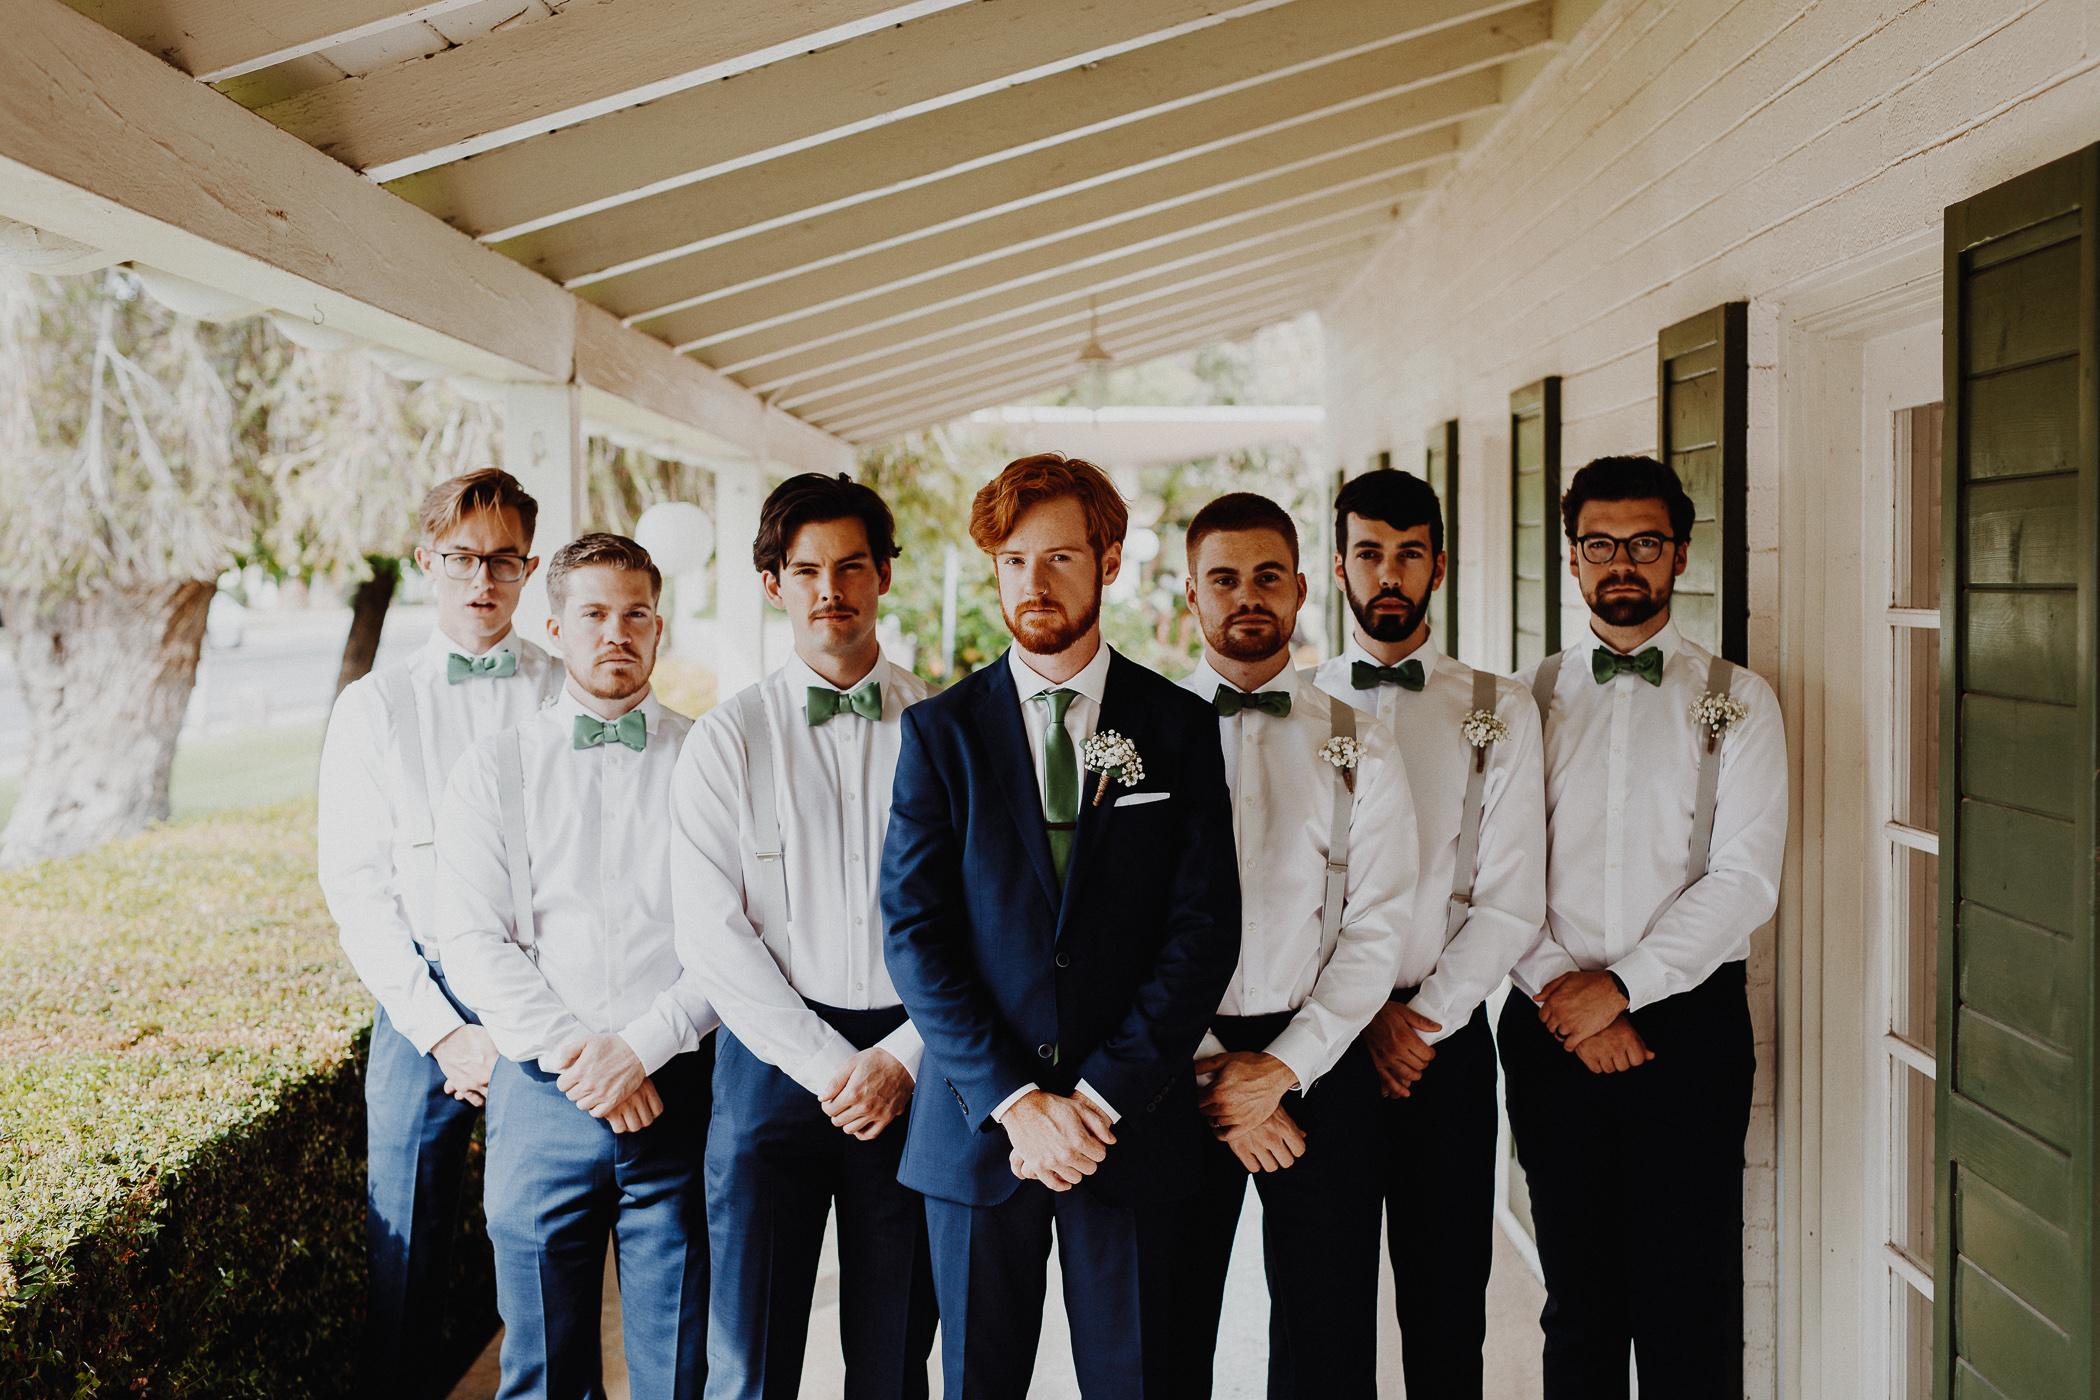 181104-Luxium-Weddings-Arizona-@matt__Le-Brandon-Kariana-Phoenix-Valley-Garden-Center-1033.jpg